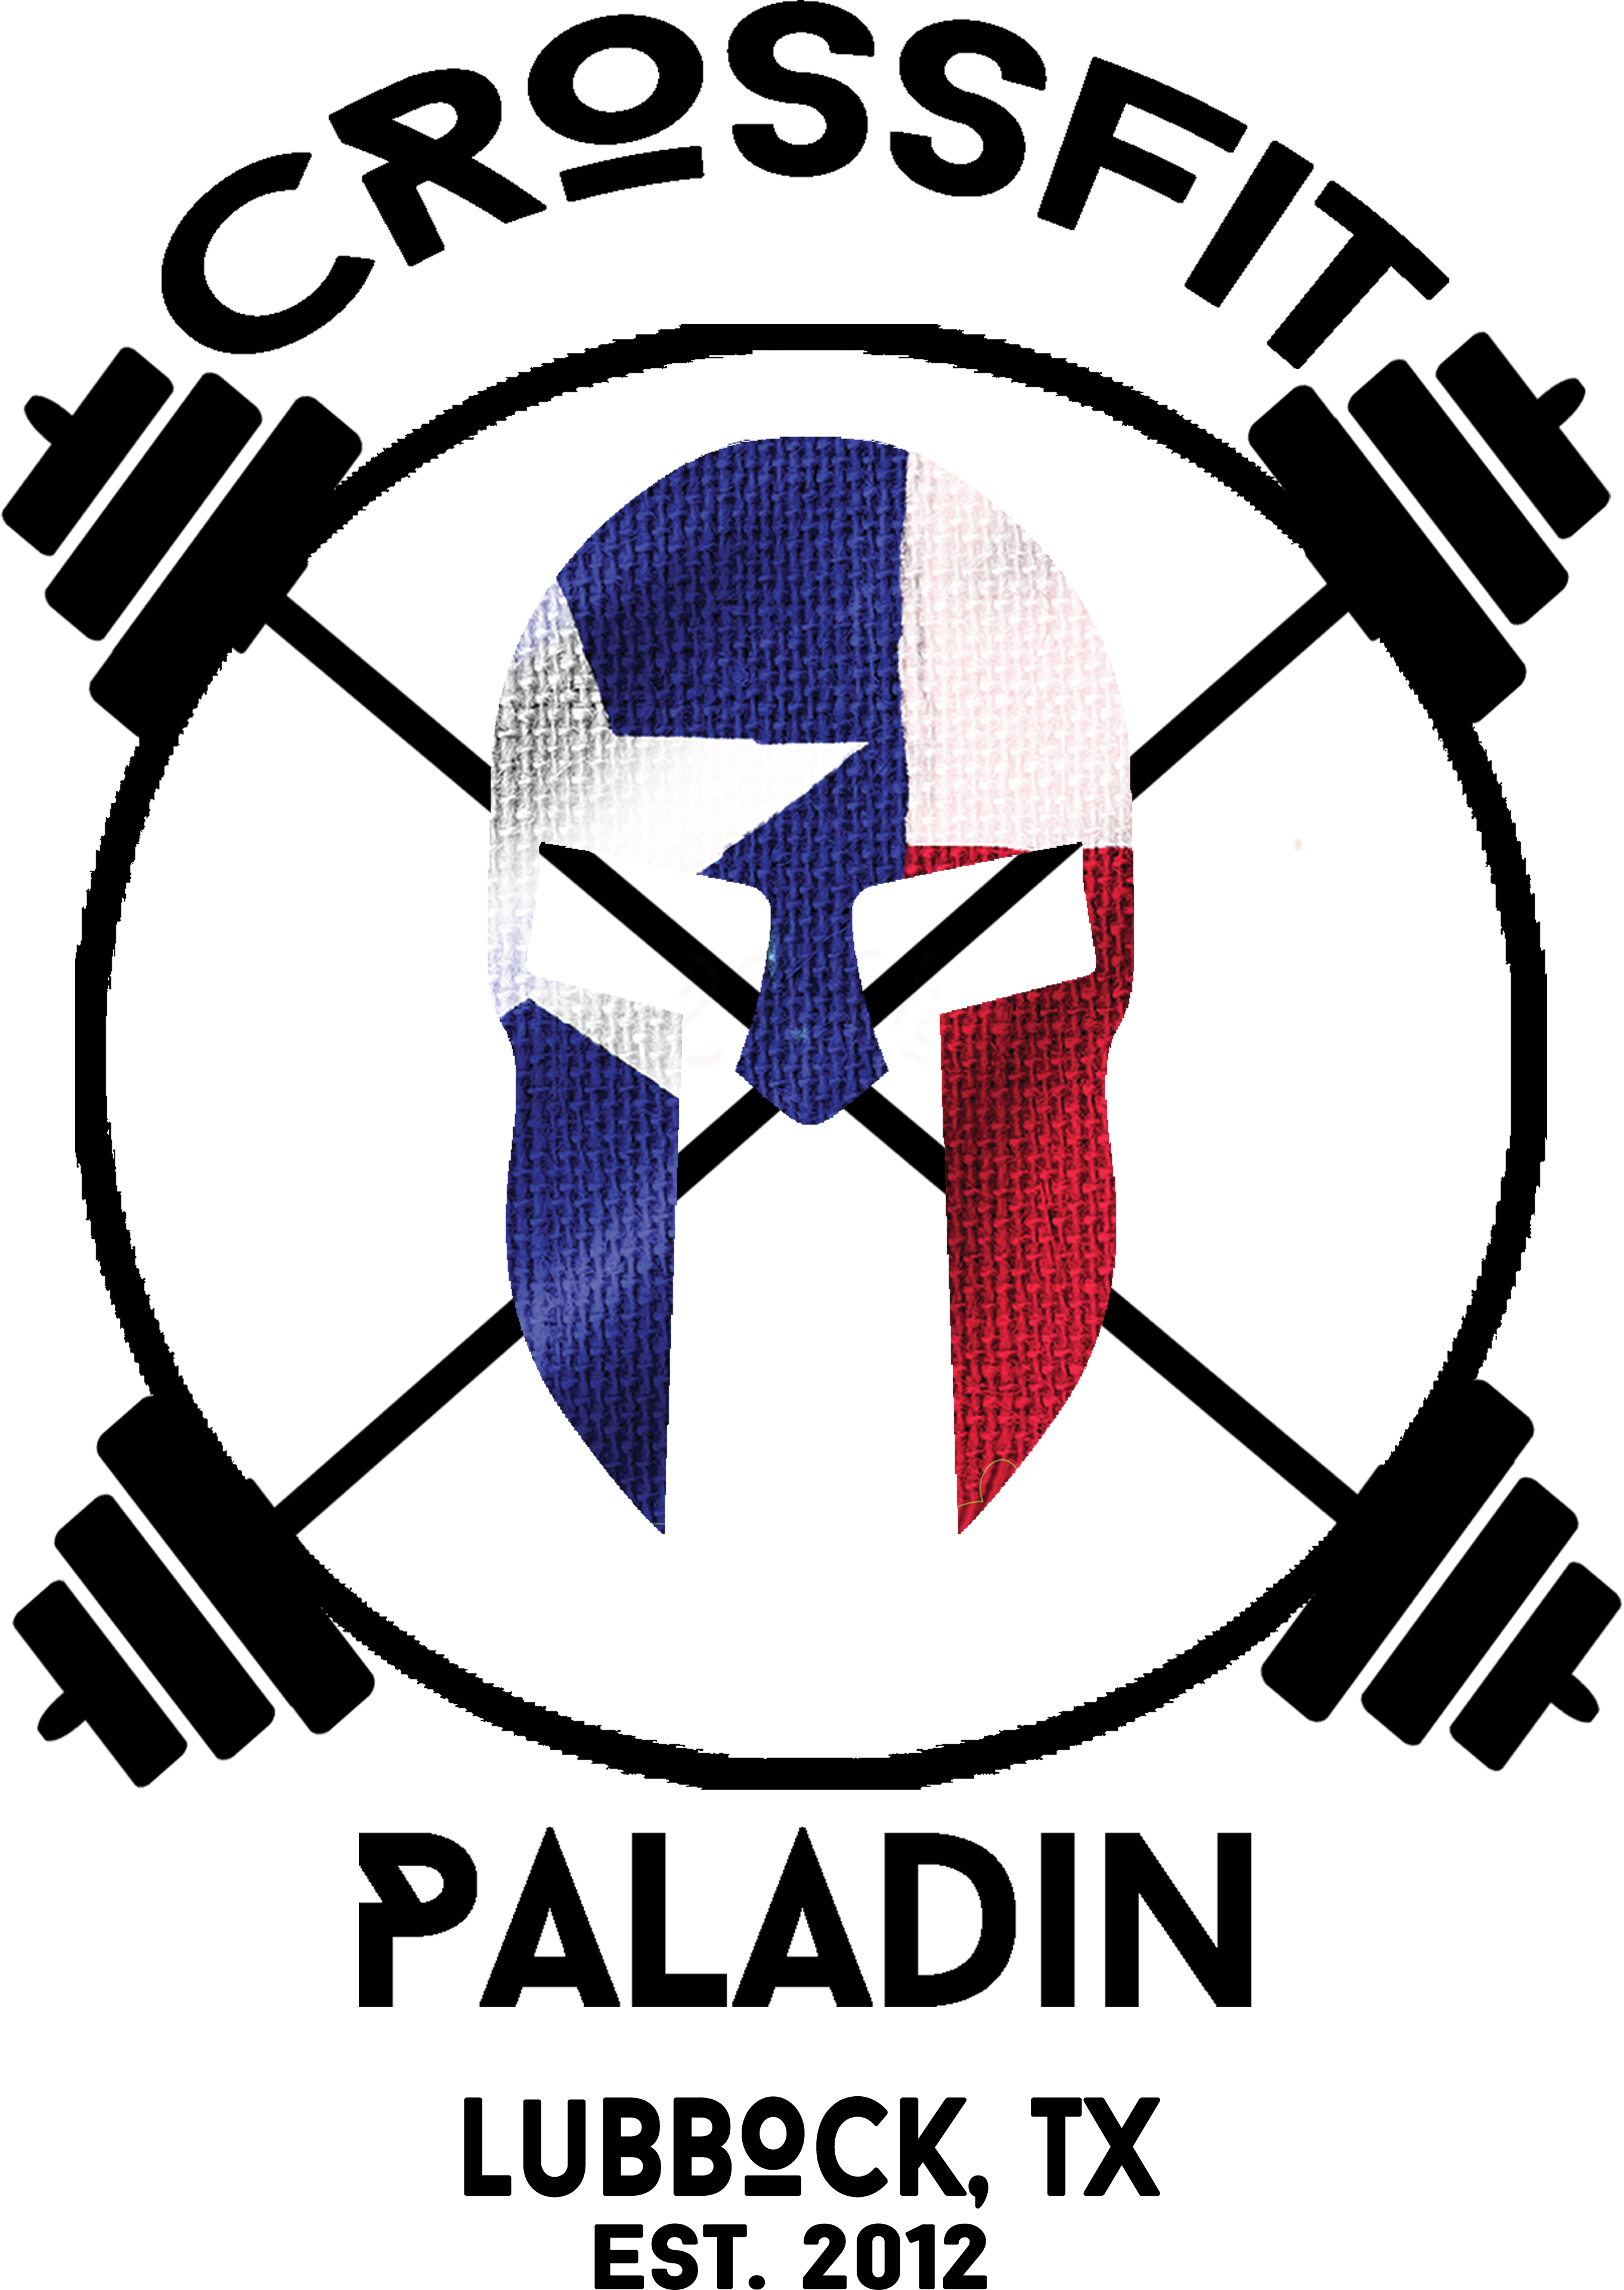 Crossfit Paladin logo